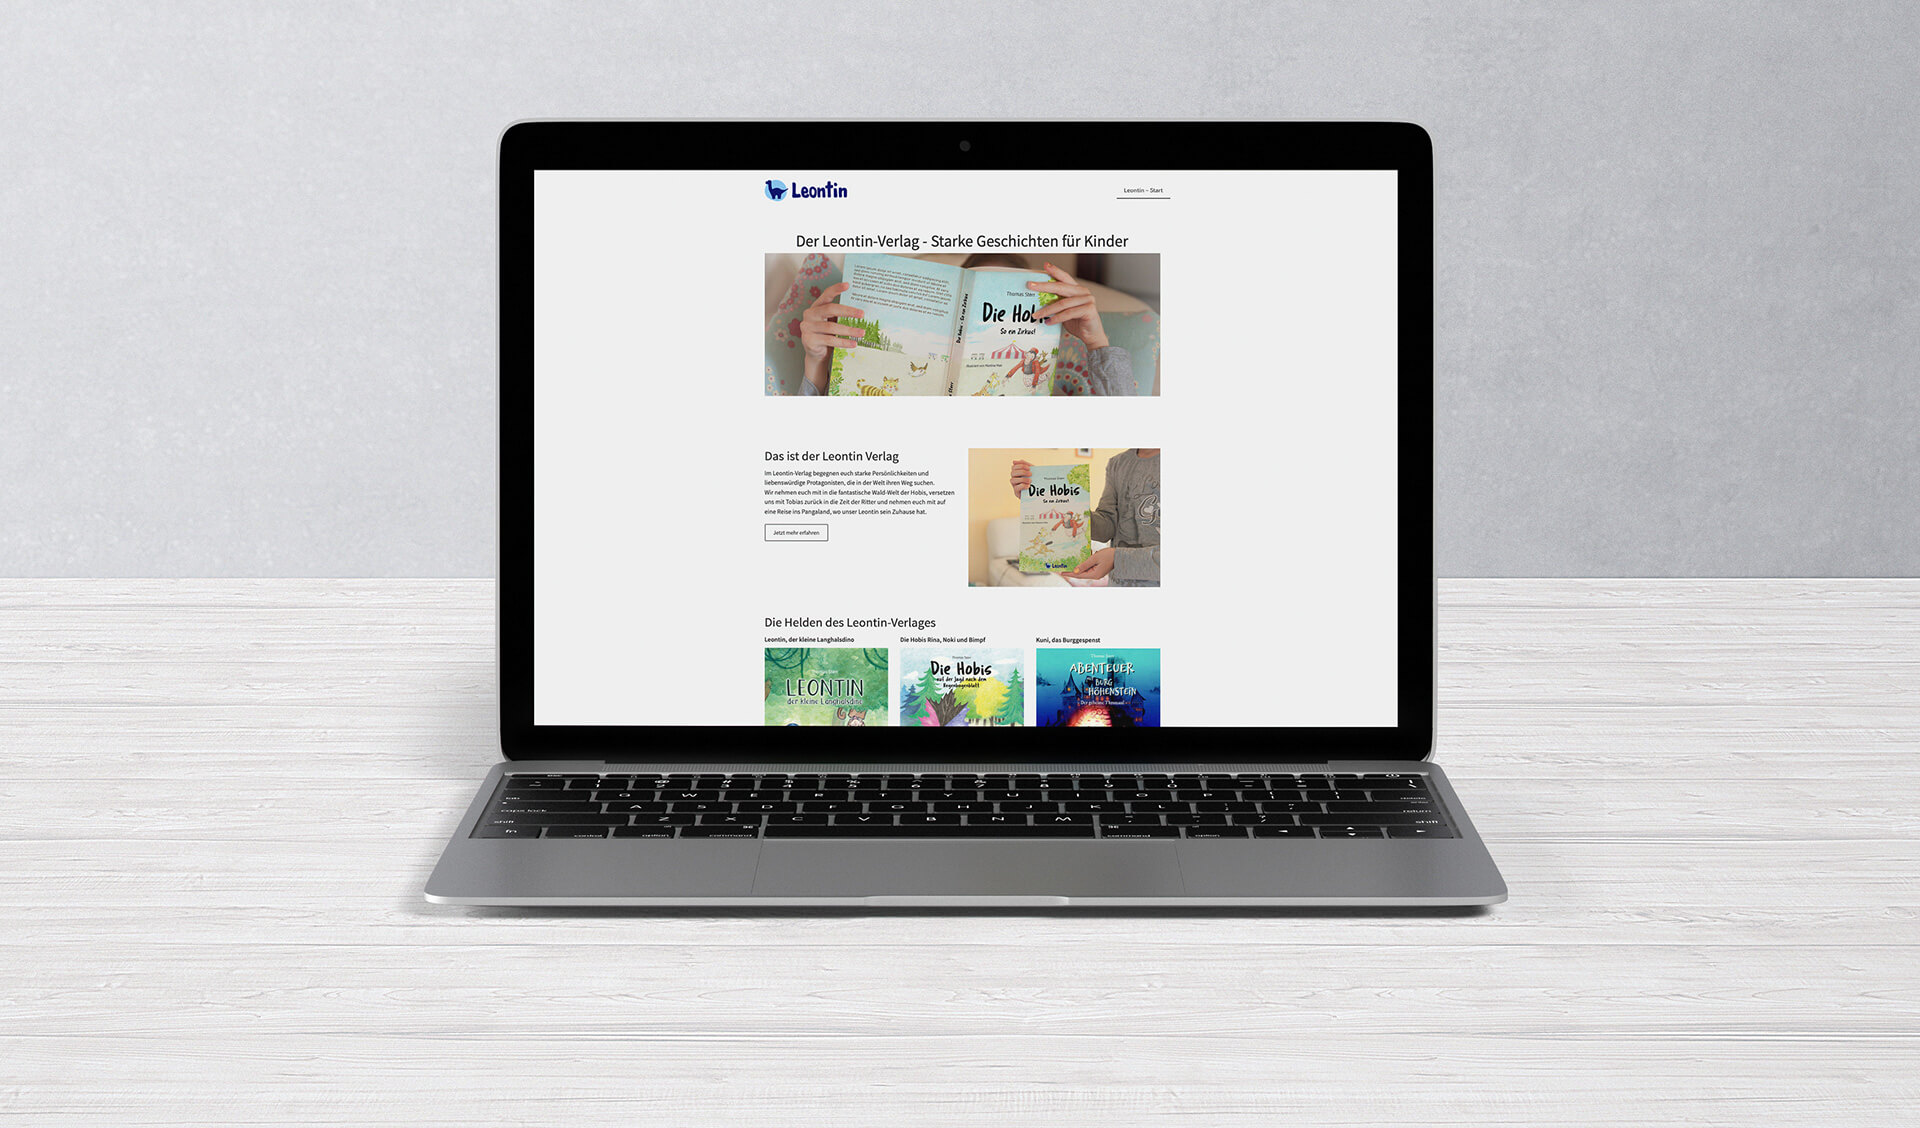 gniced-daniel gross-pfaffenhofen-grafikdesign-digital-webdesign-webentwicklung-5